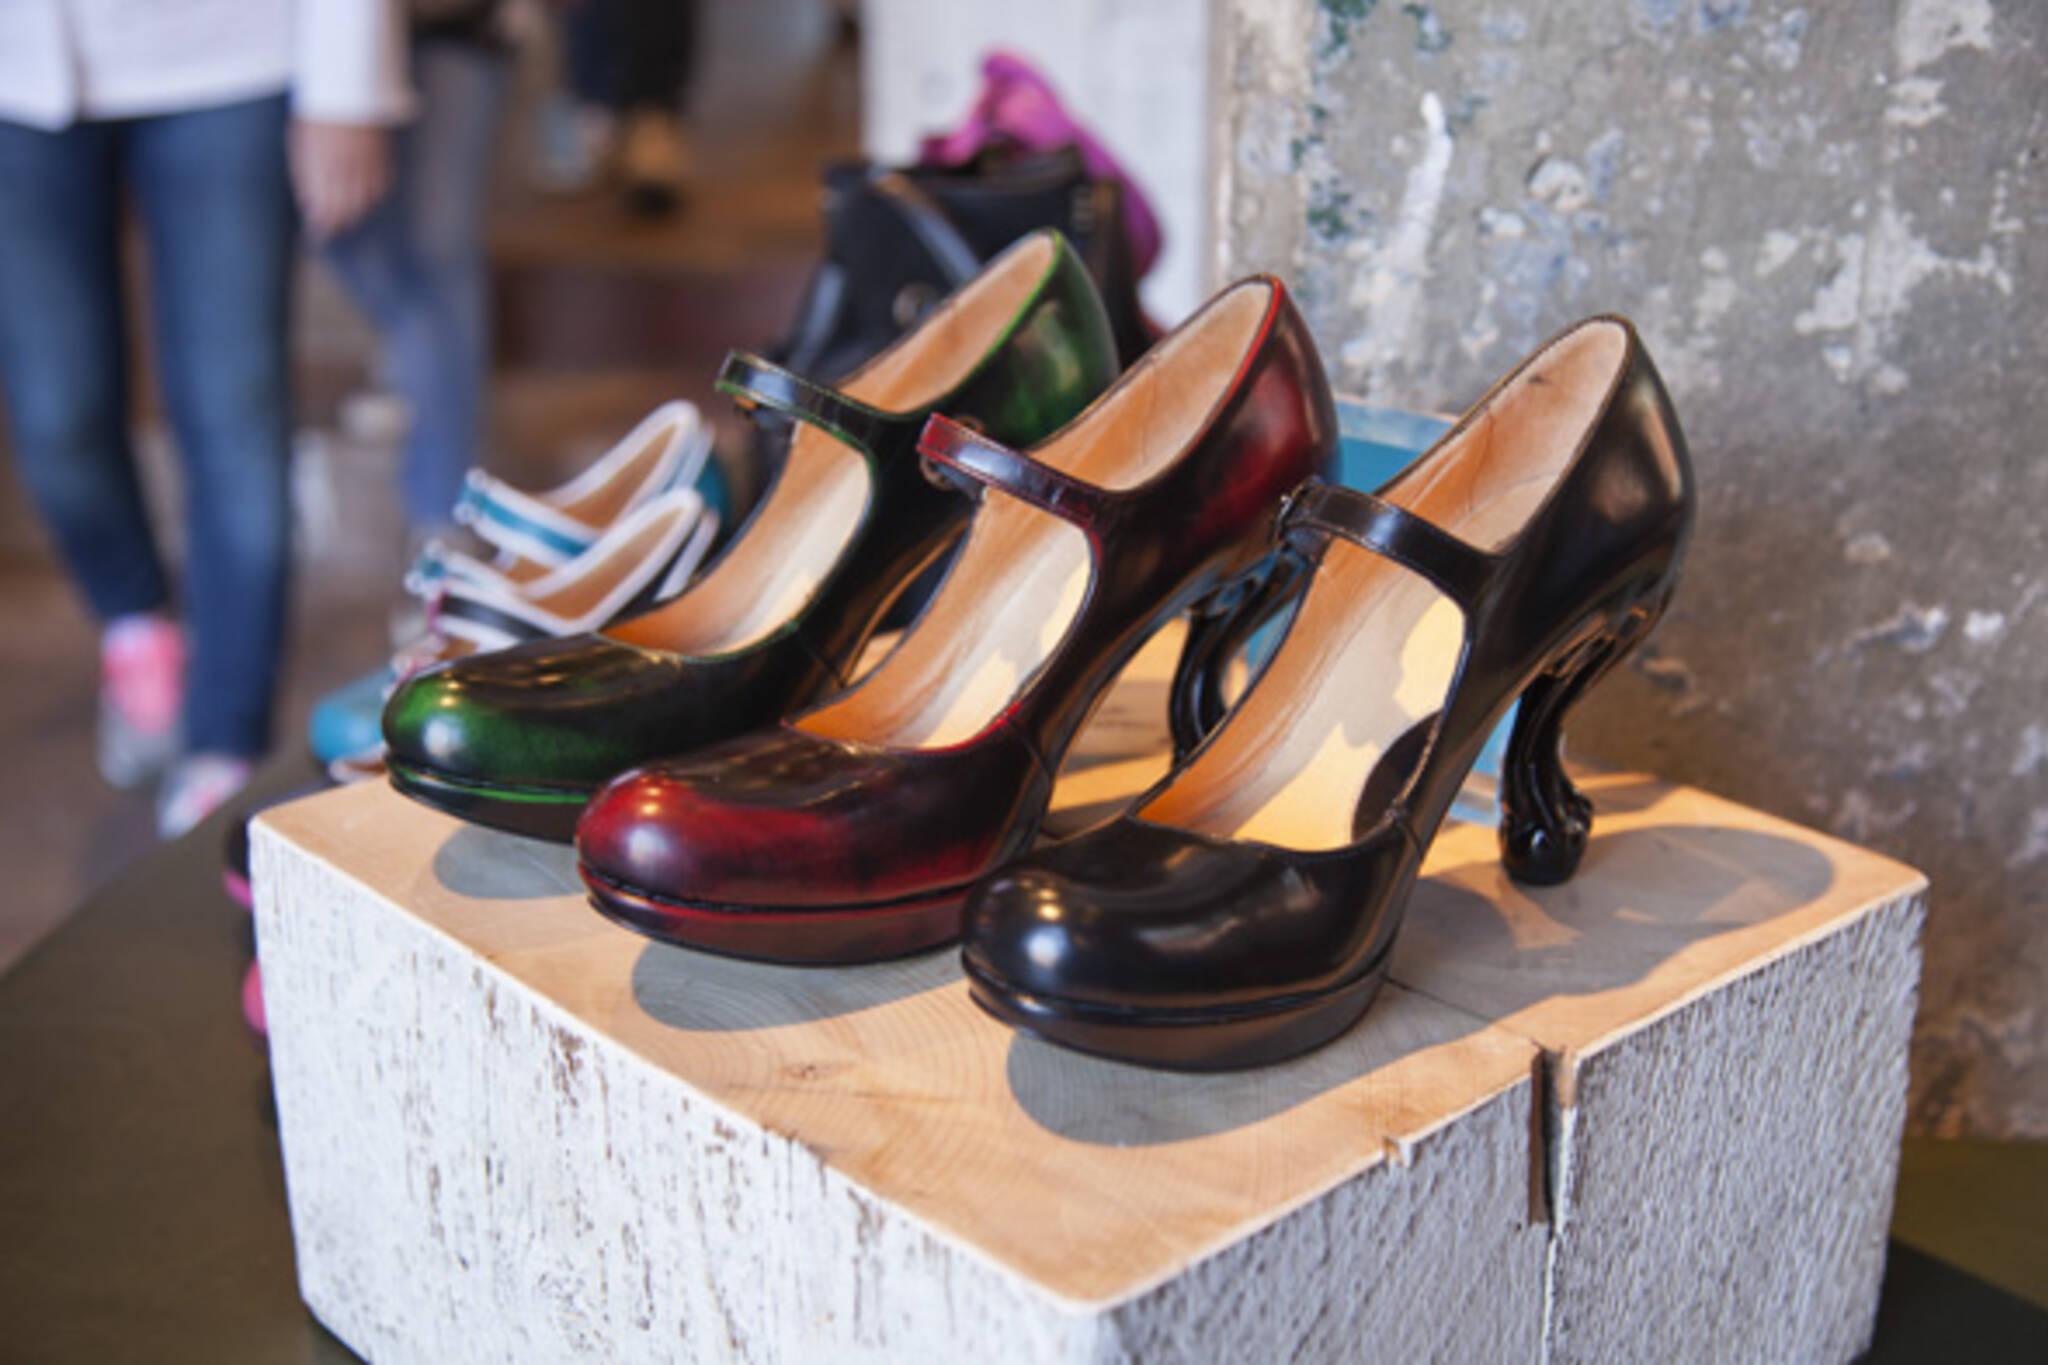 John Fluevog Shoes Distillery District